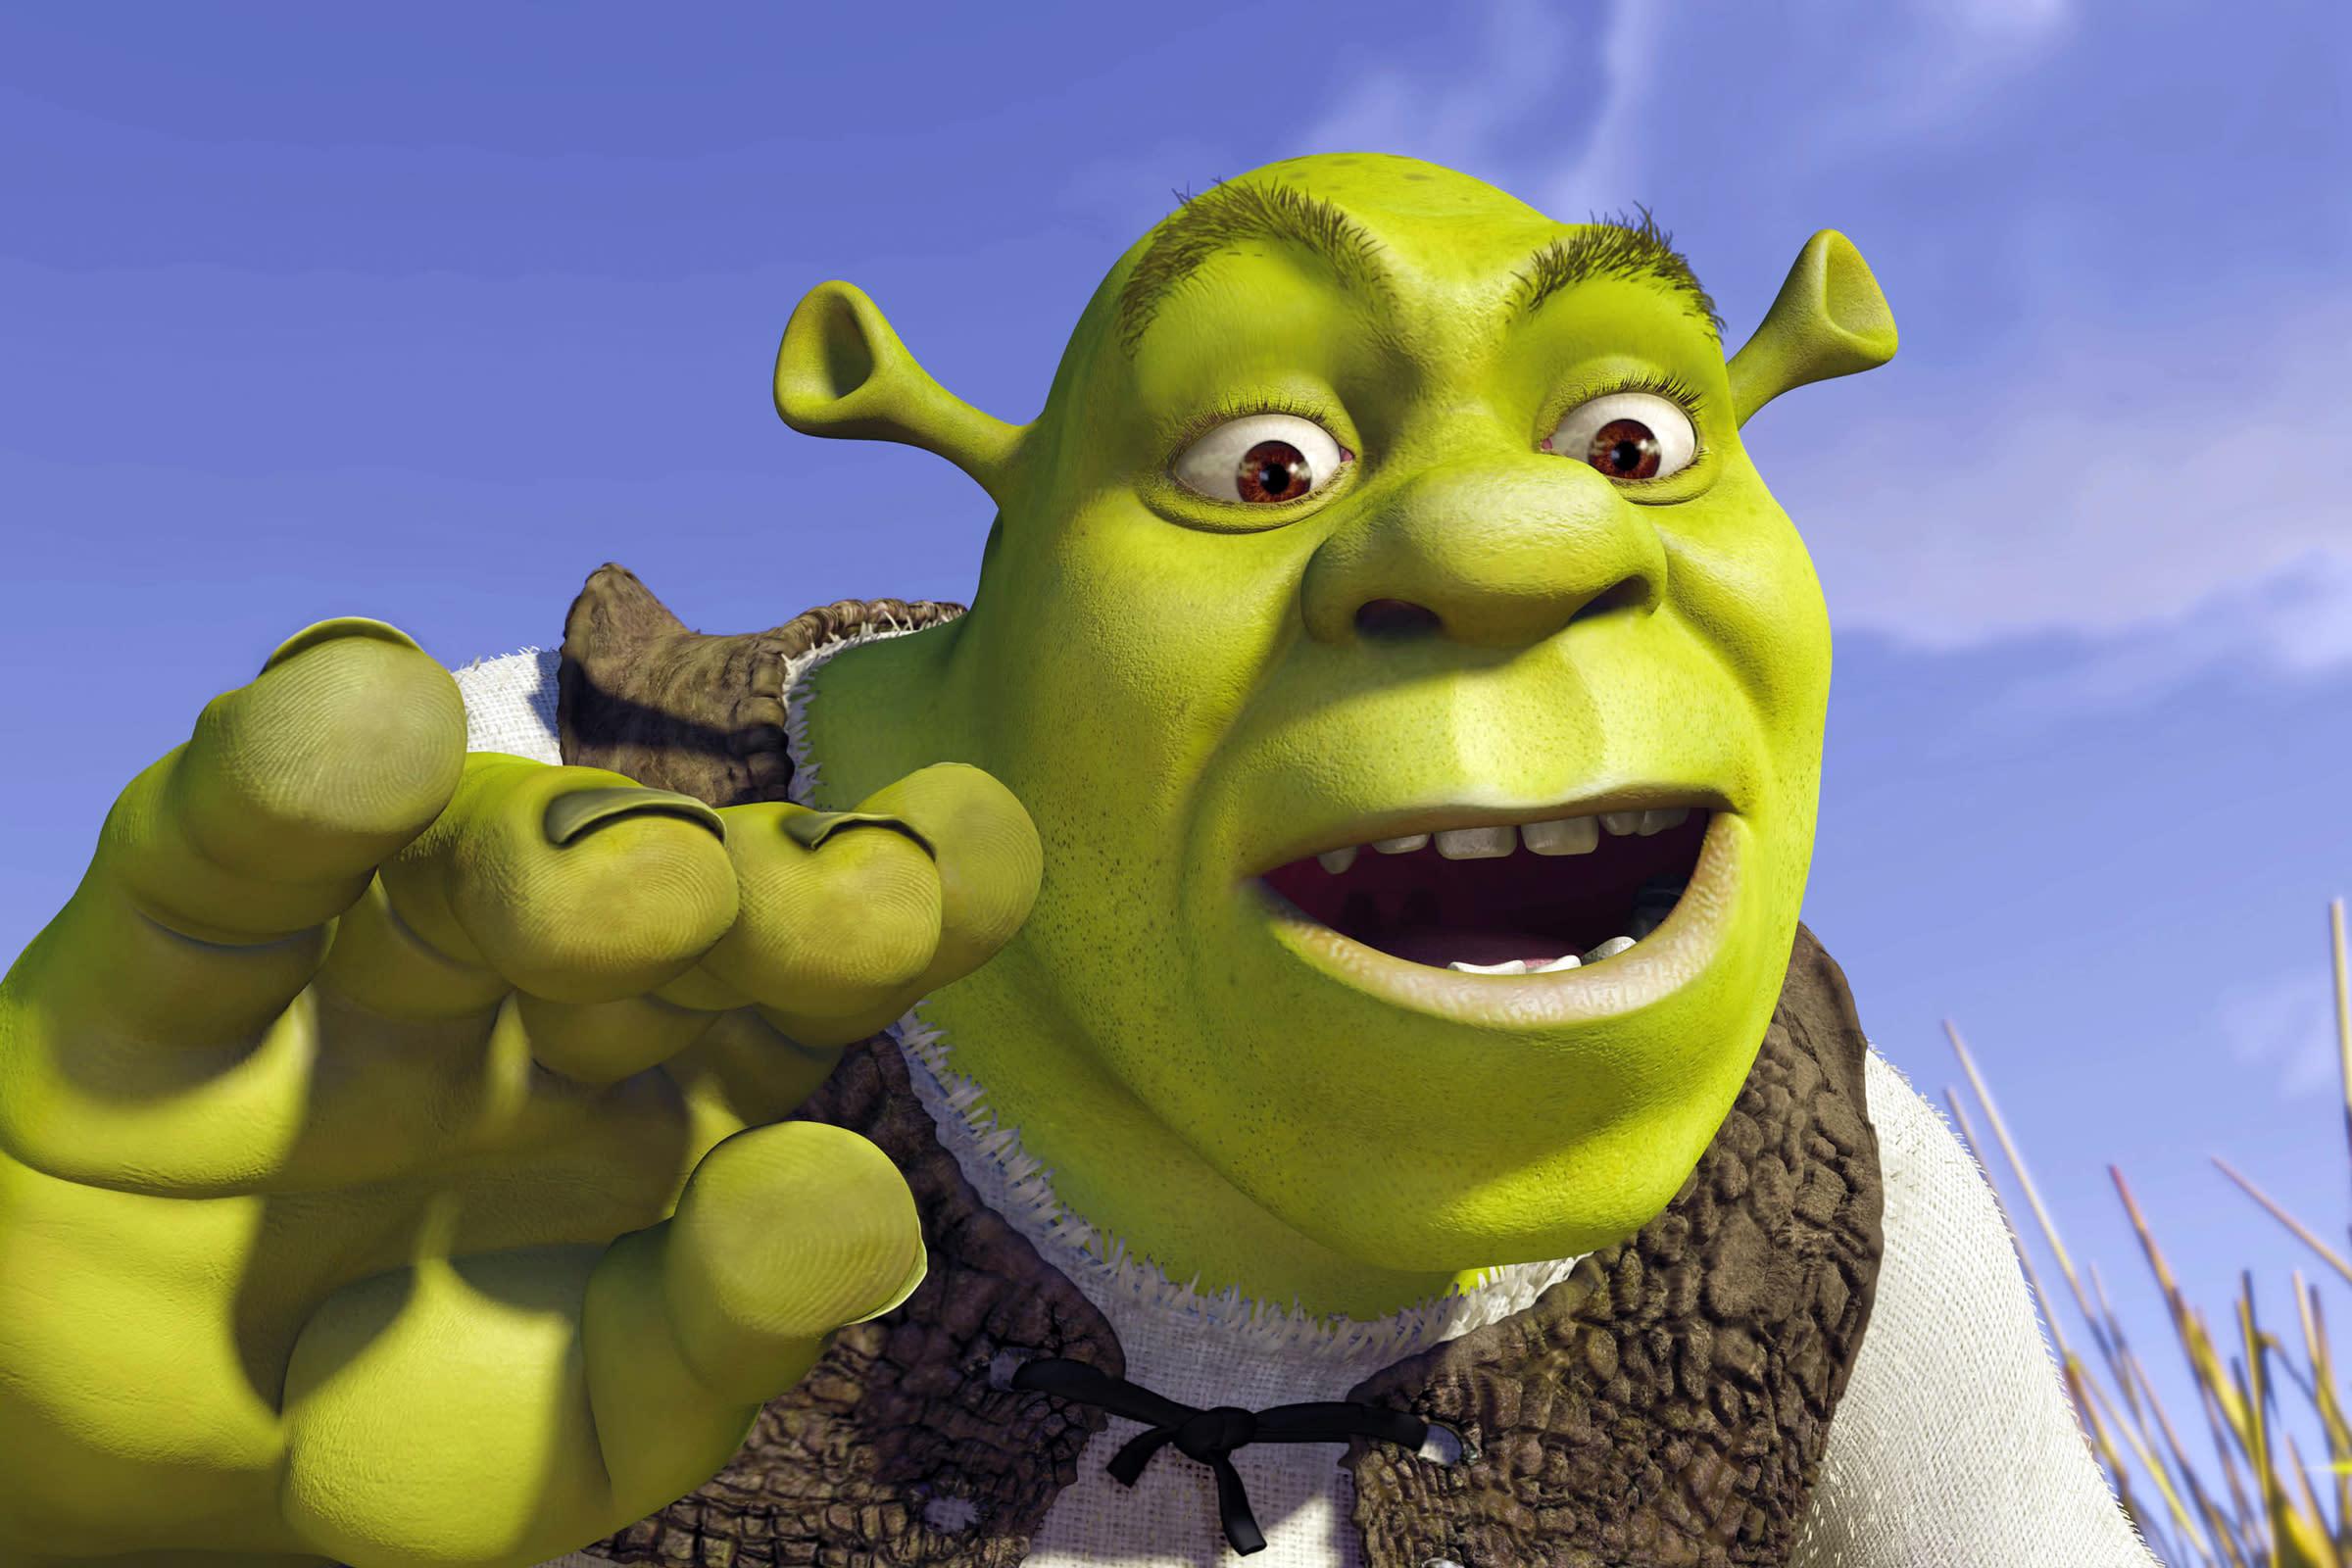 Shrek Soundtrack Making Vinyl Debut For Special Edition Reissue